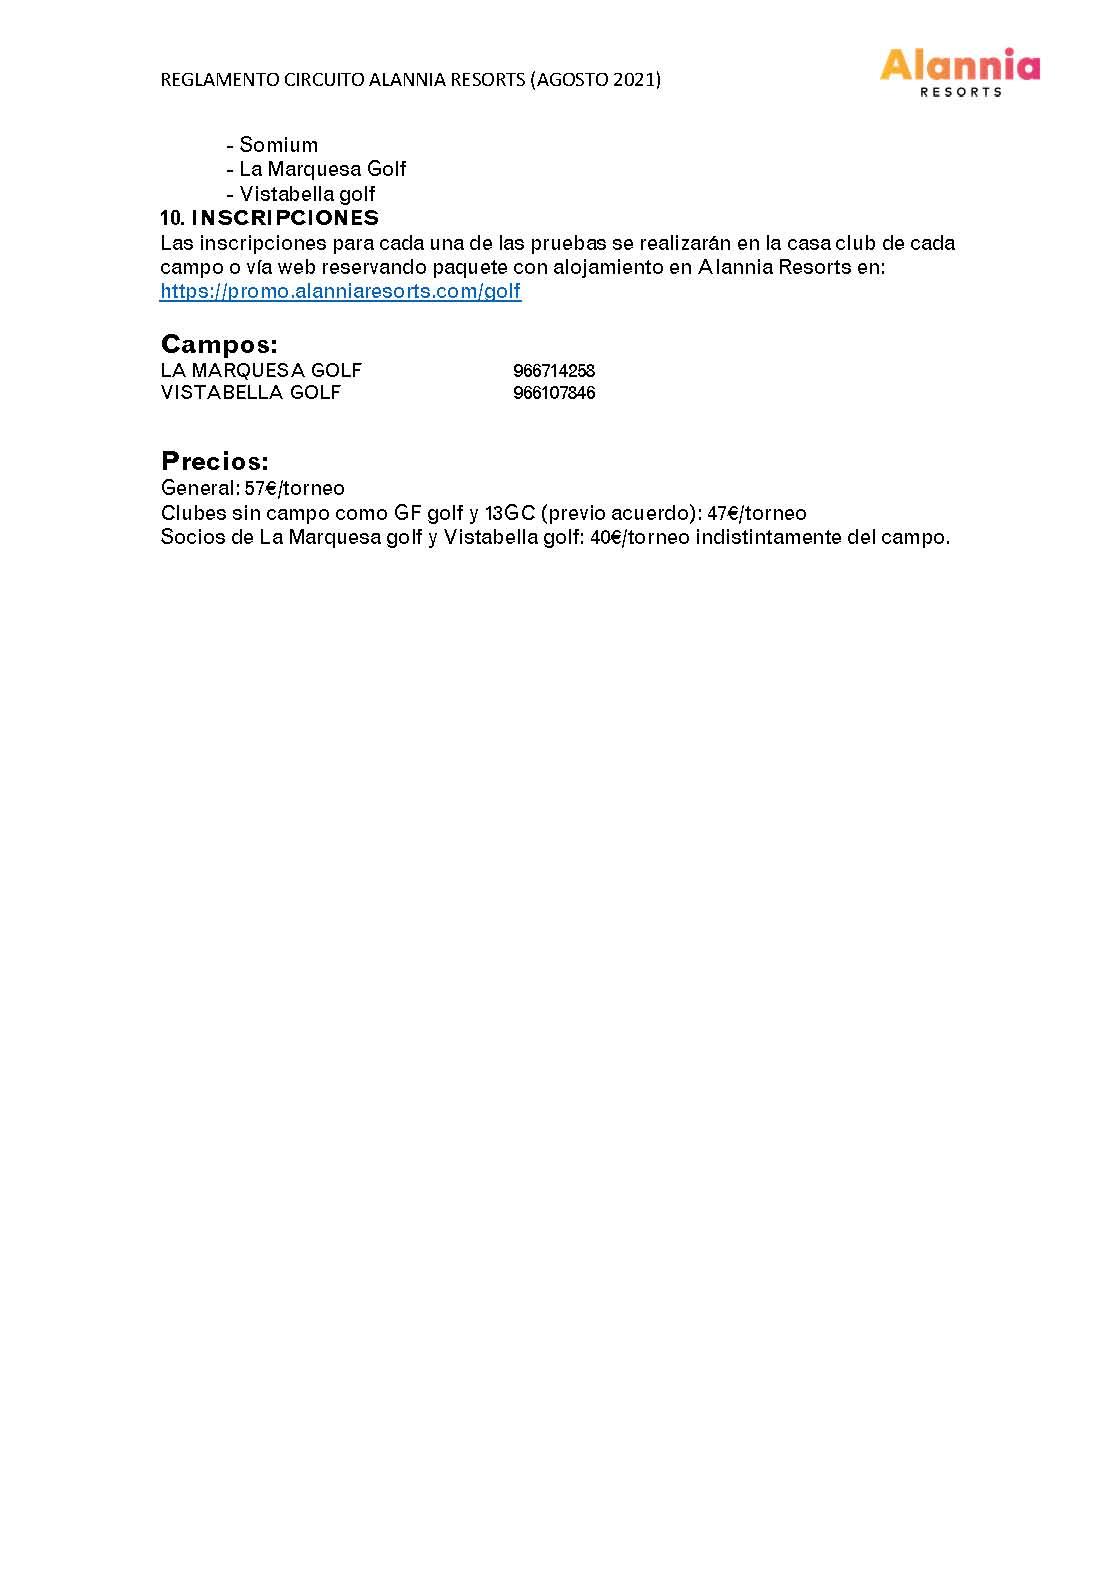 210911 MQS, Reglamento del torneo (3)